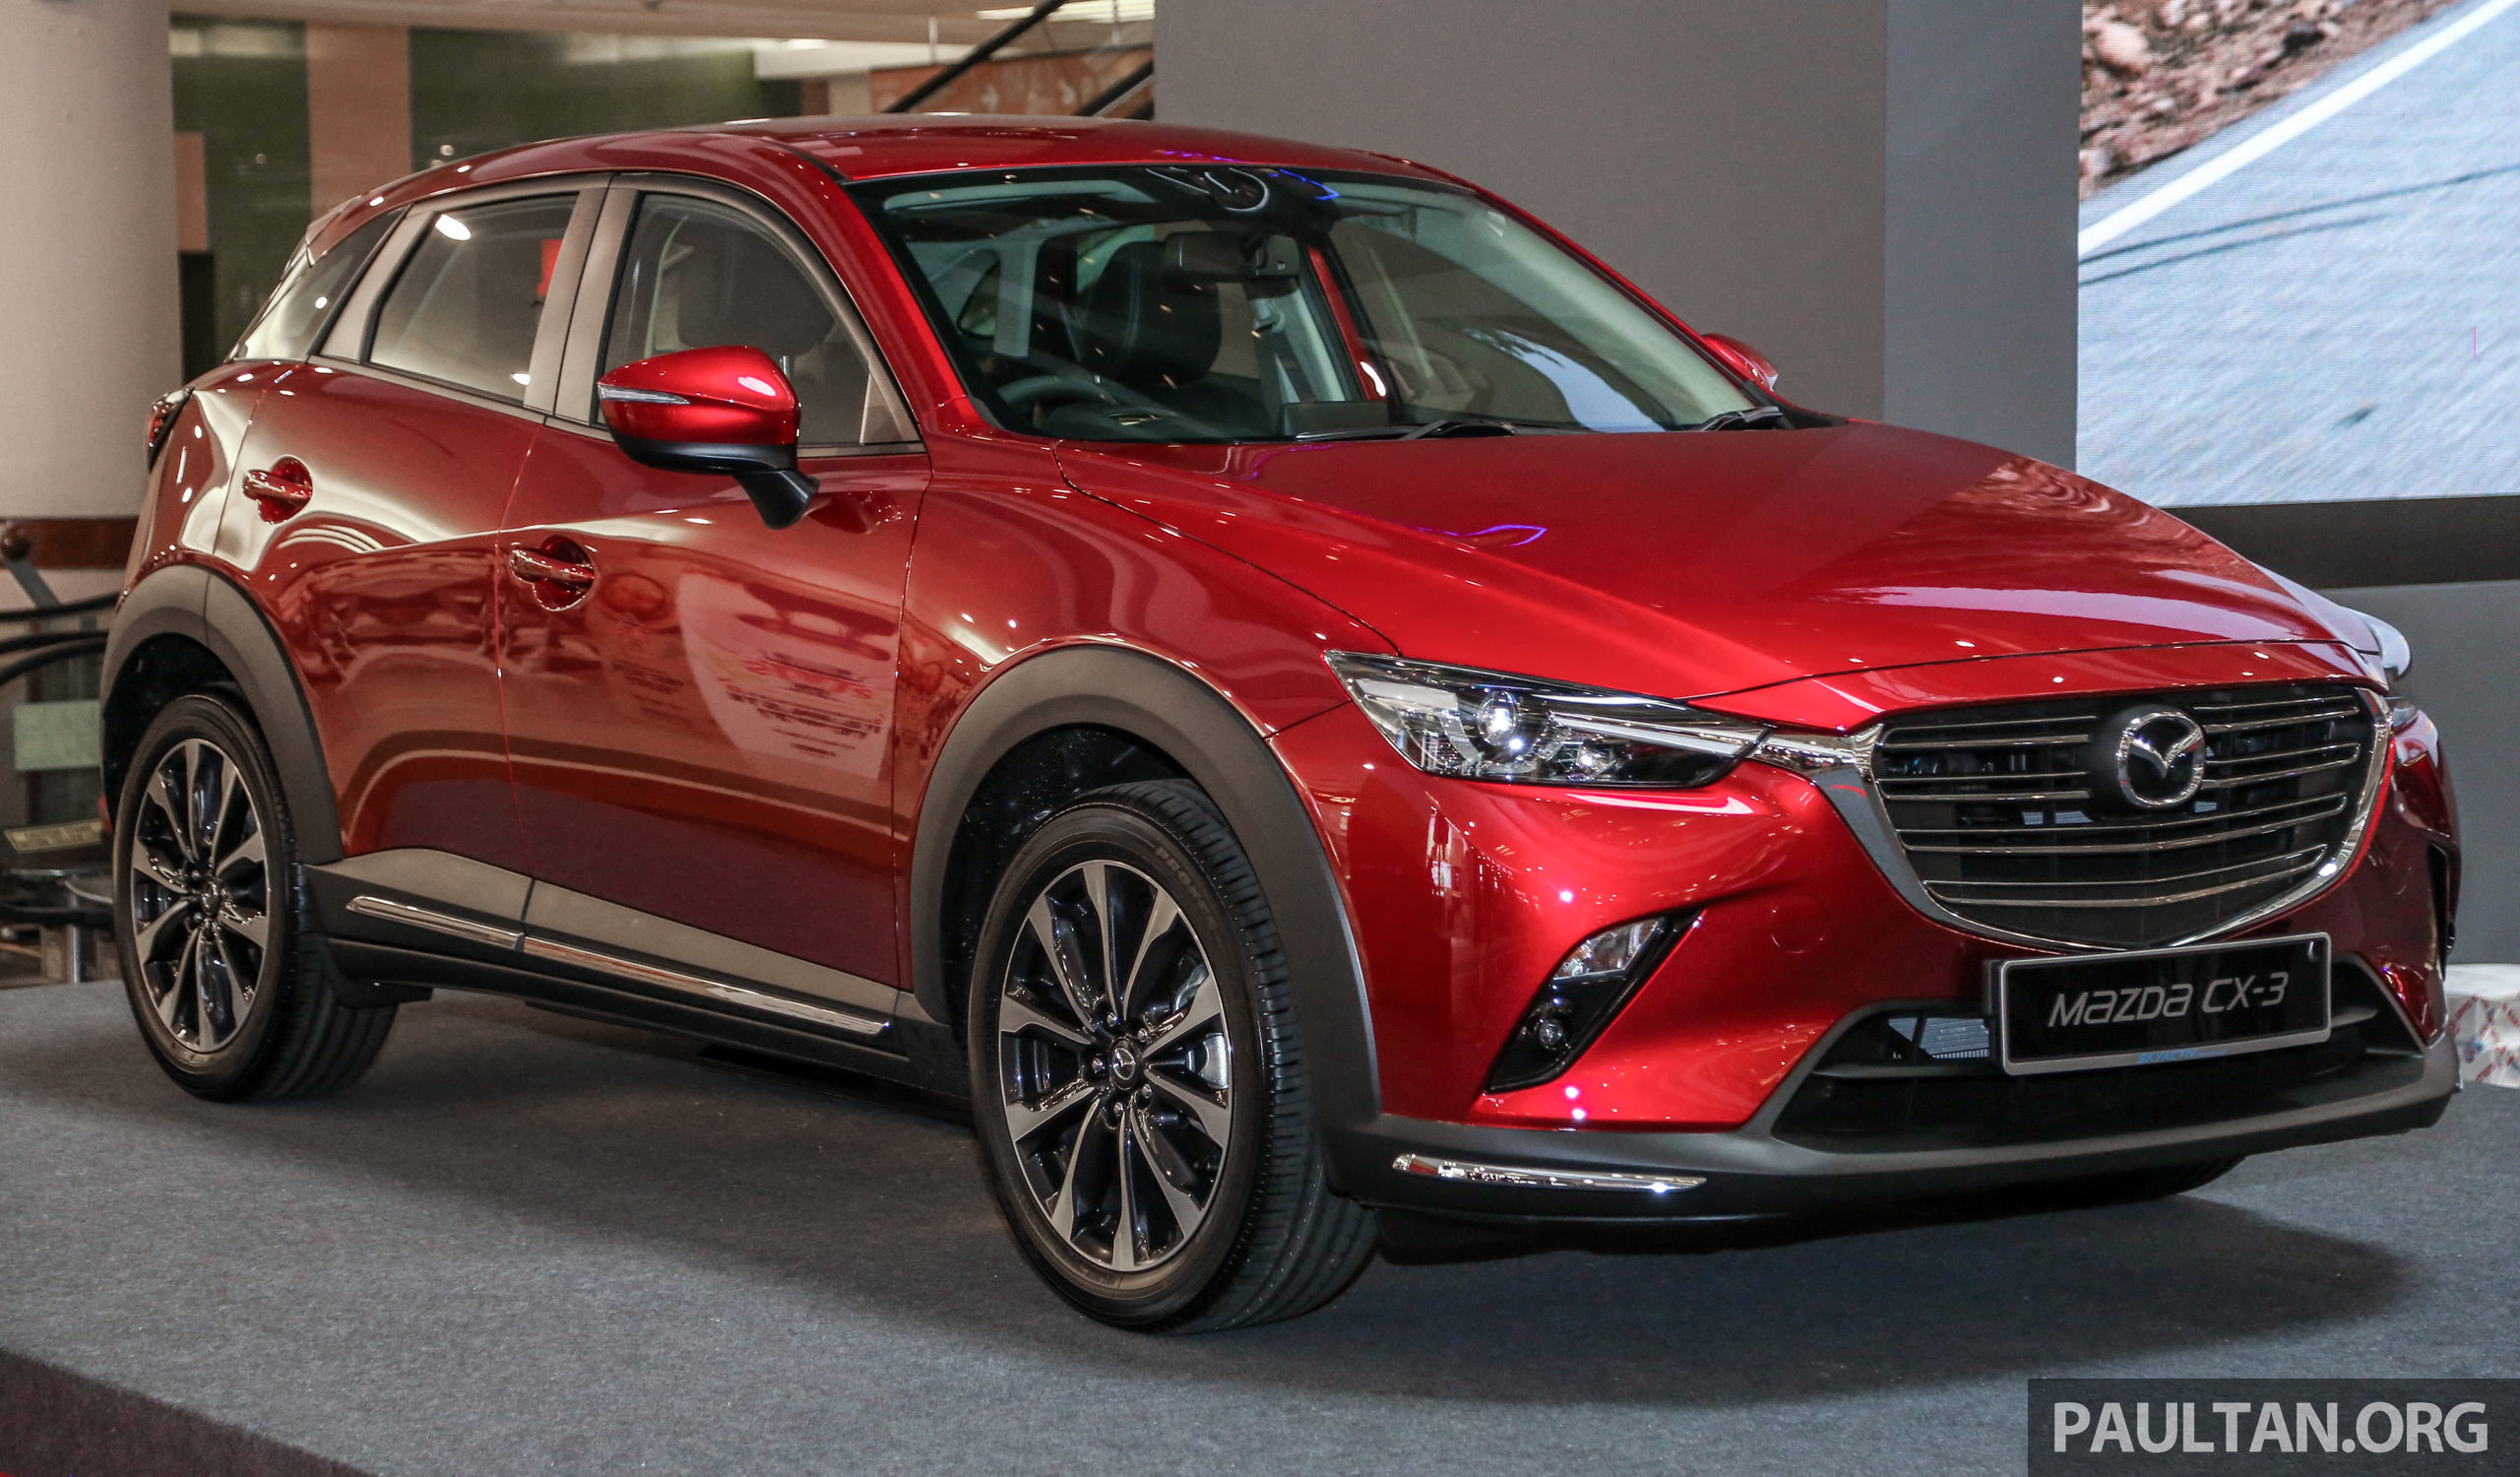 Kekurangan Mazda C3 Perbandingan Harga